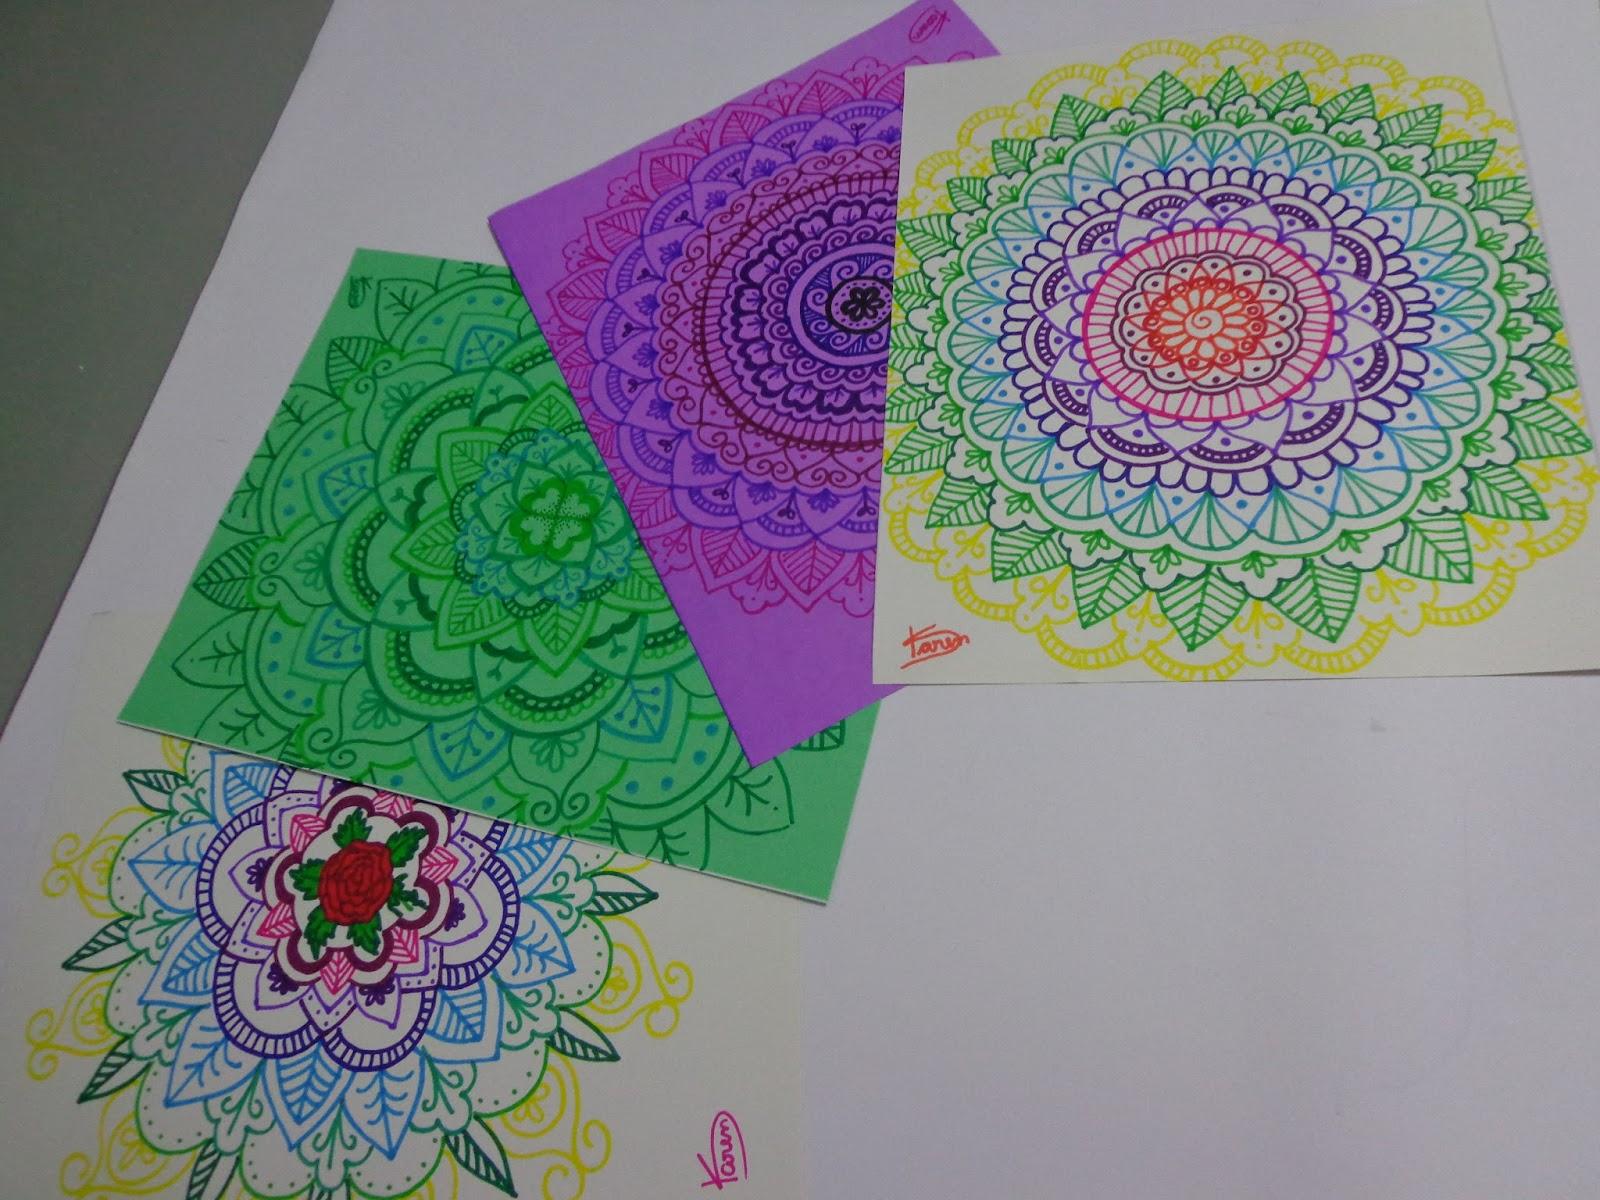 Artes Da Karen Mandalas Coloridas